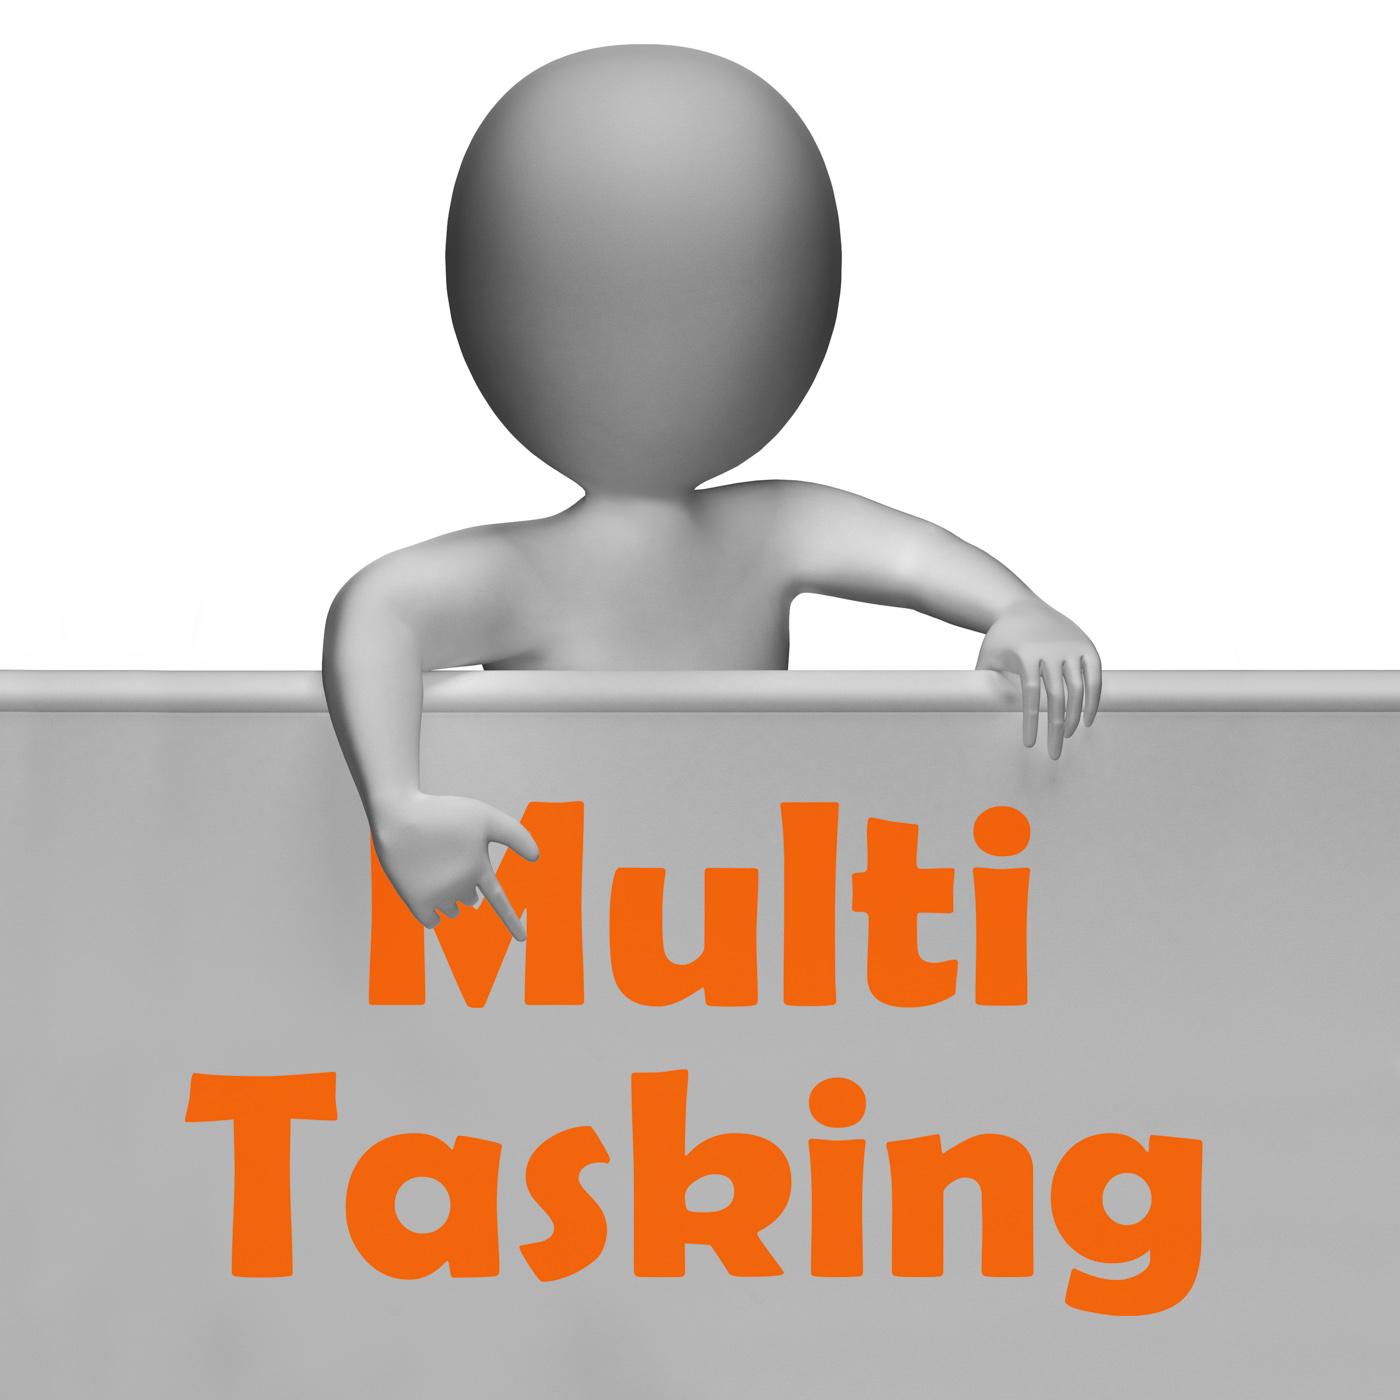 Multitasking sign means doing multiple tasks simultaneously photo